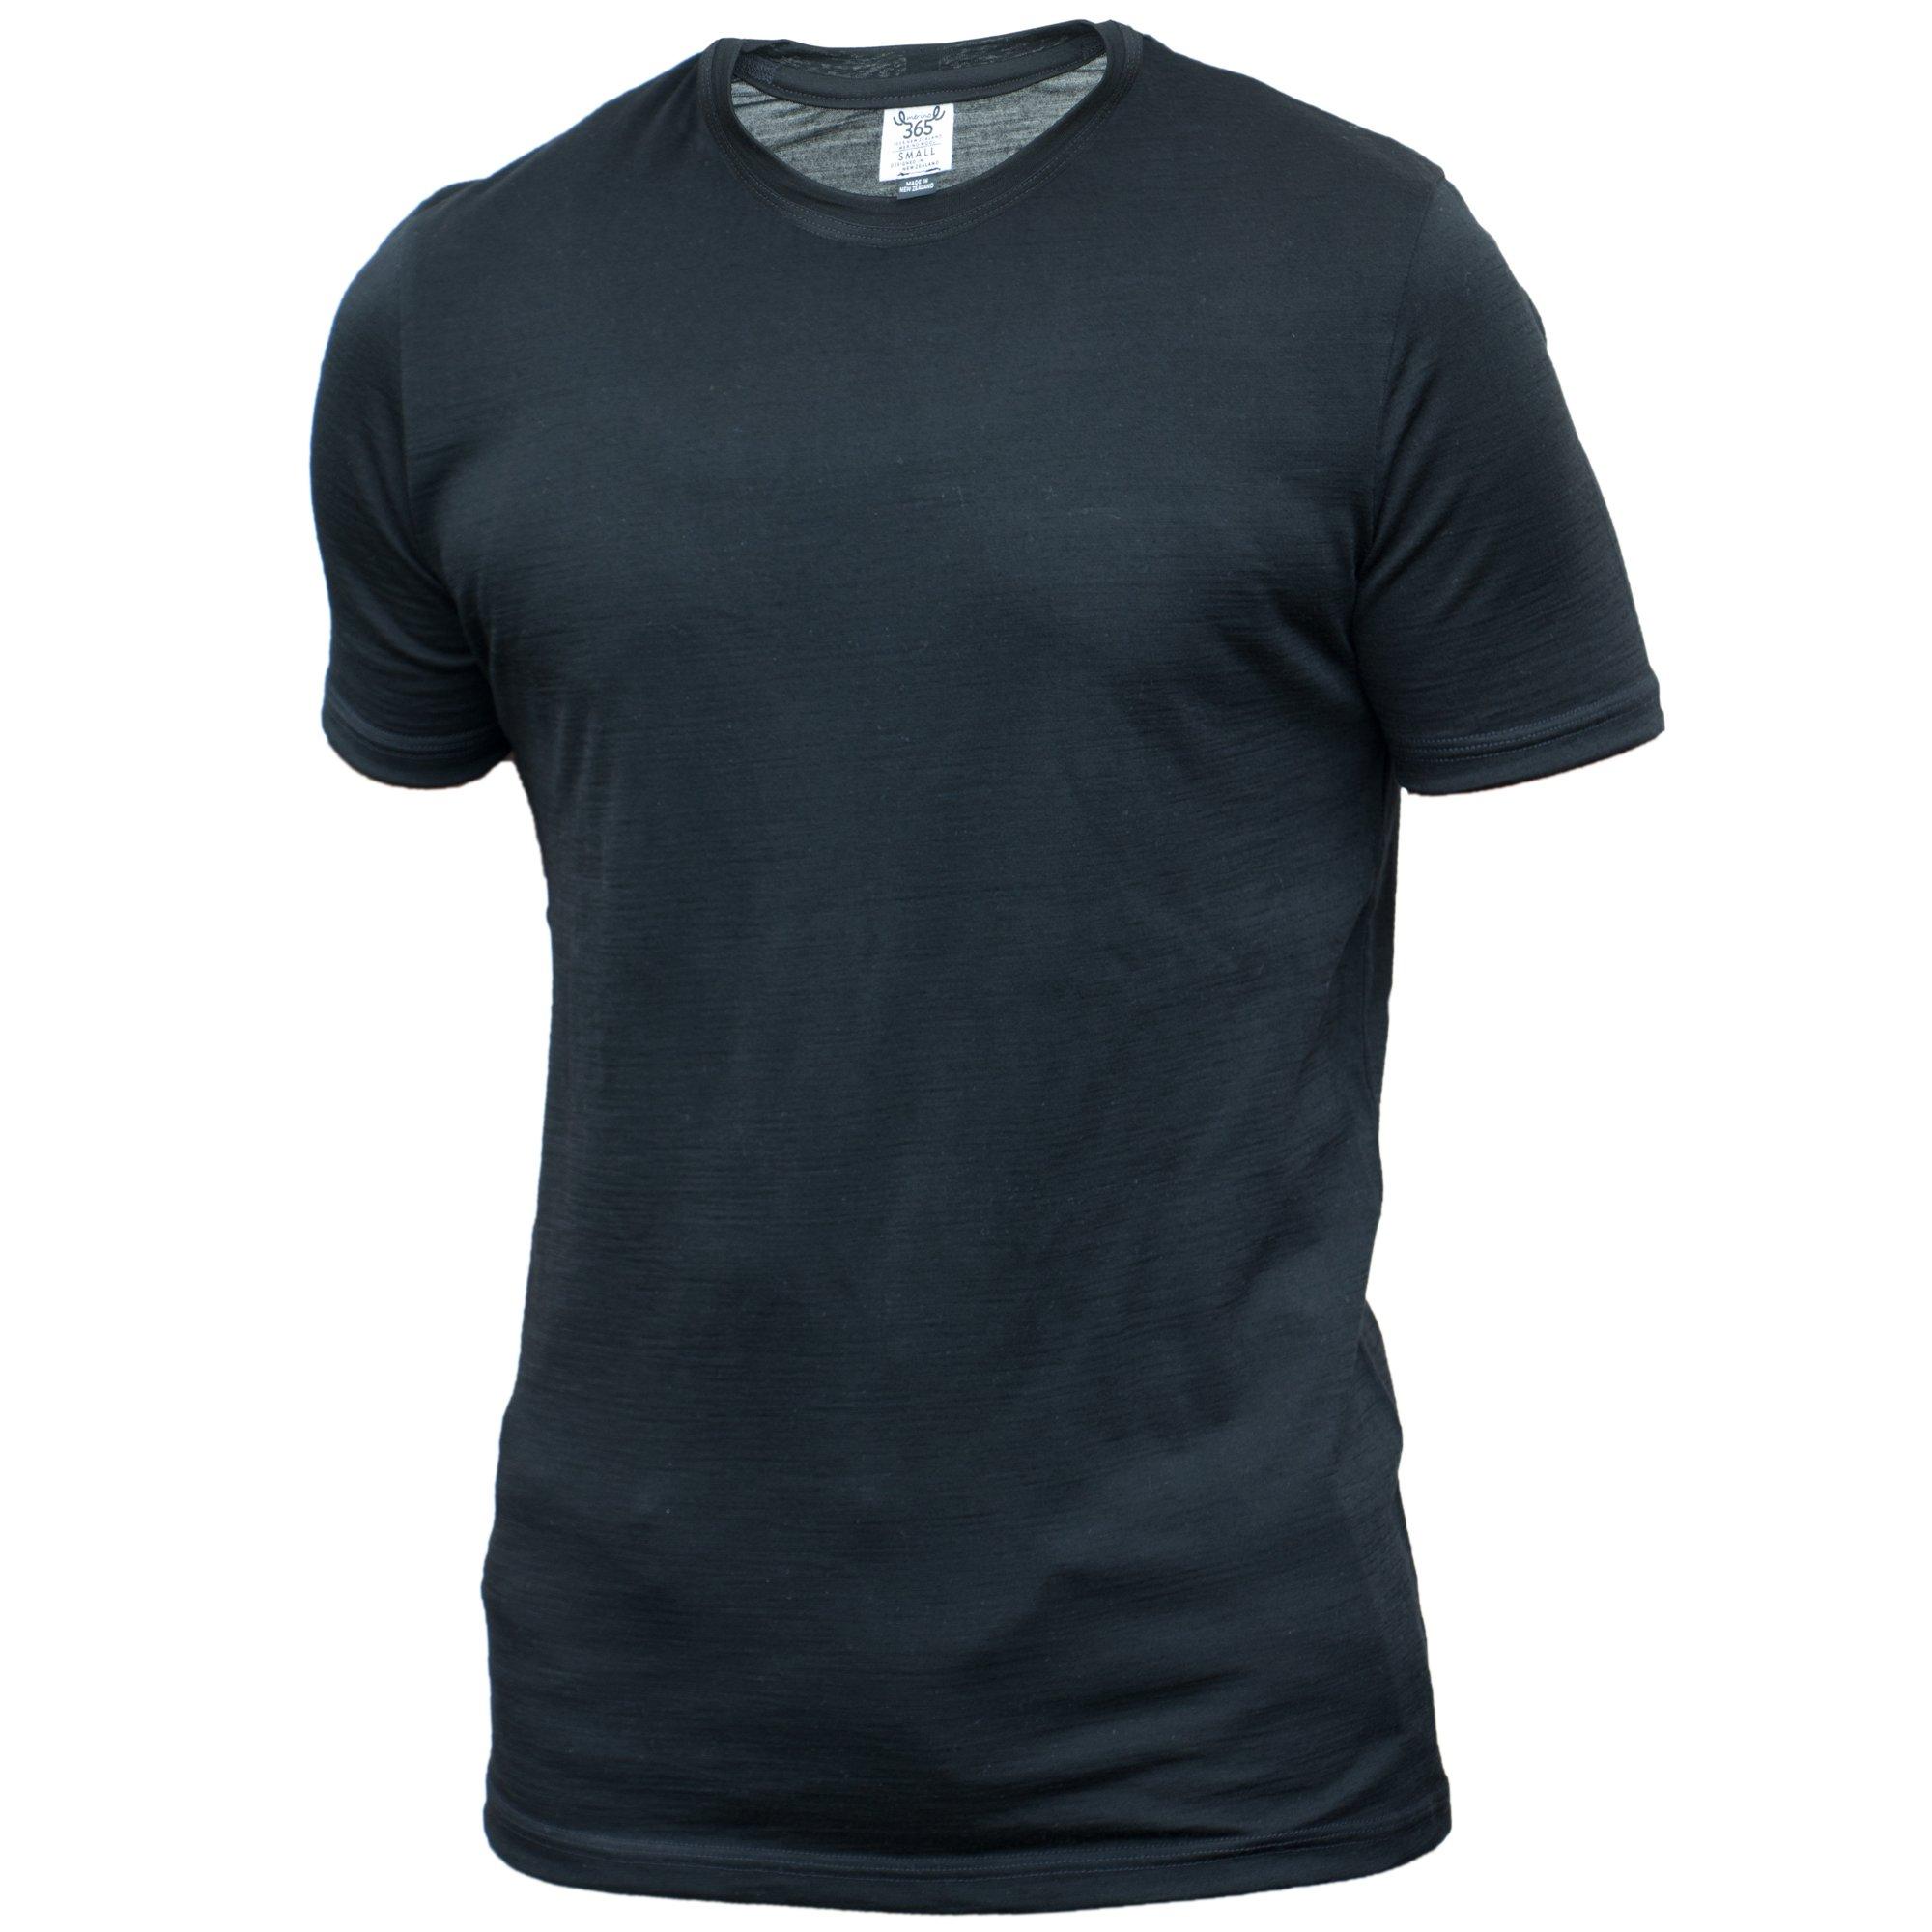 Merino 365 Men's Crew Short Sleeve Large, Black